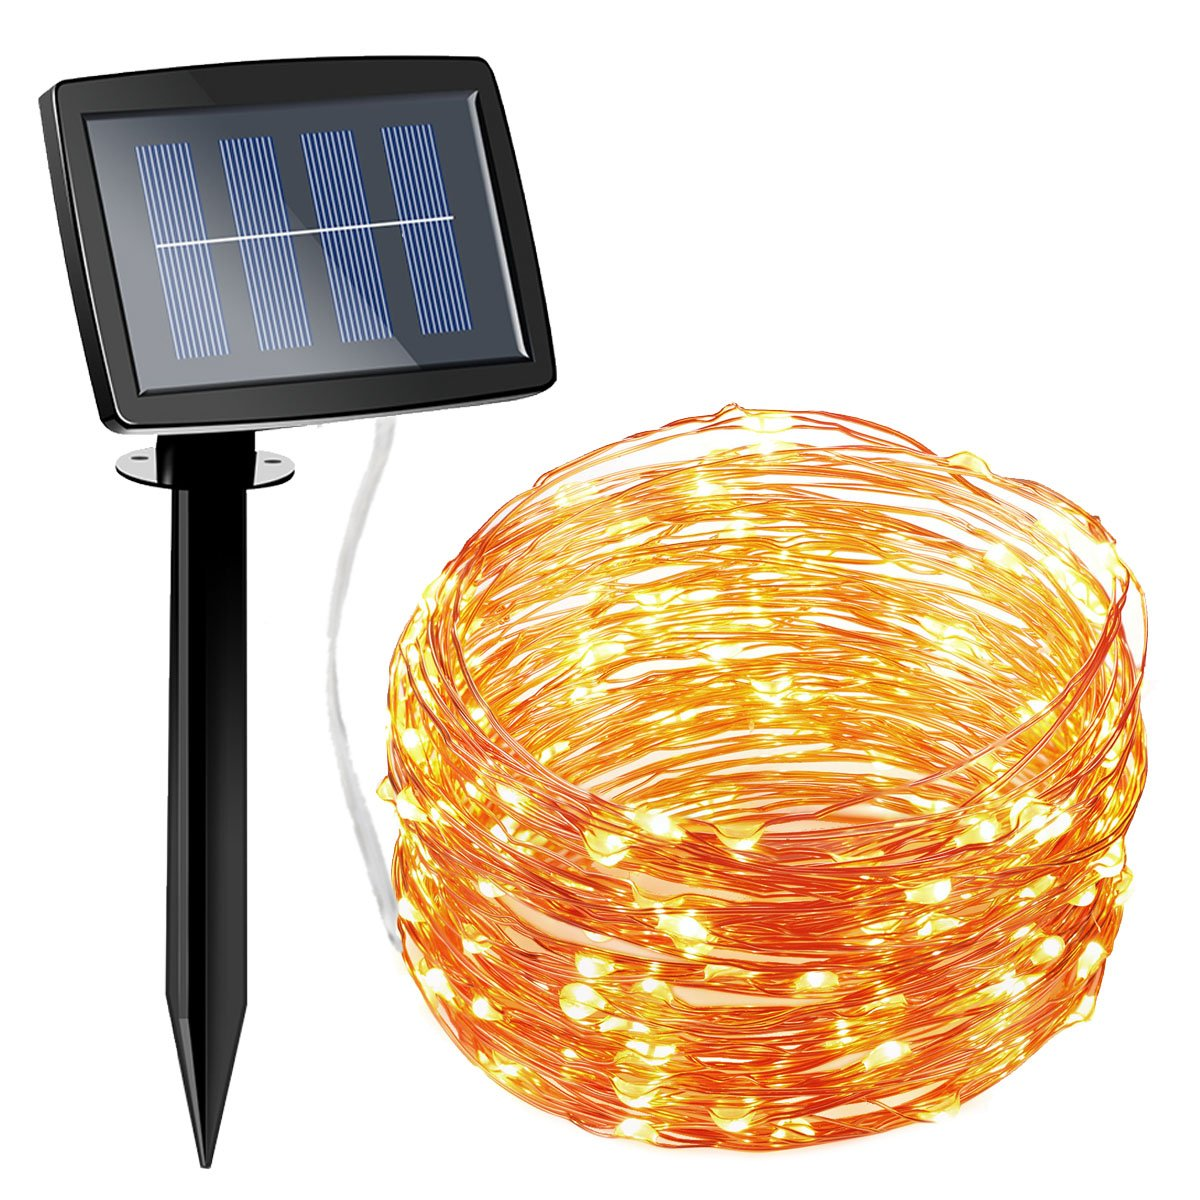 Amazon.com : AMIR Solar Powered String Lights 150 LED, 2 Modes ...